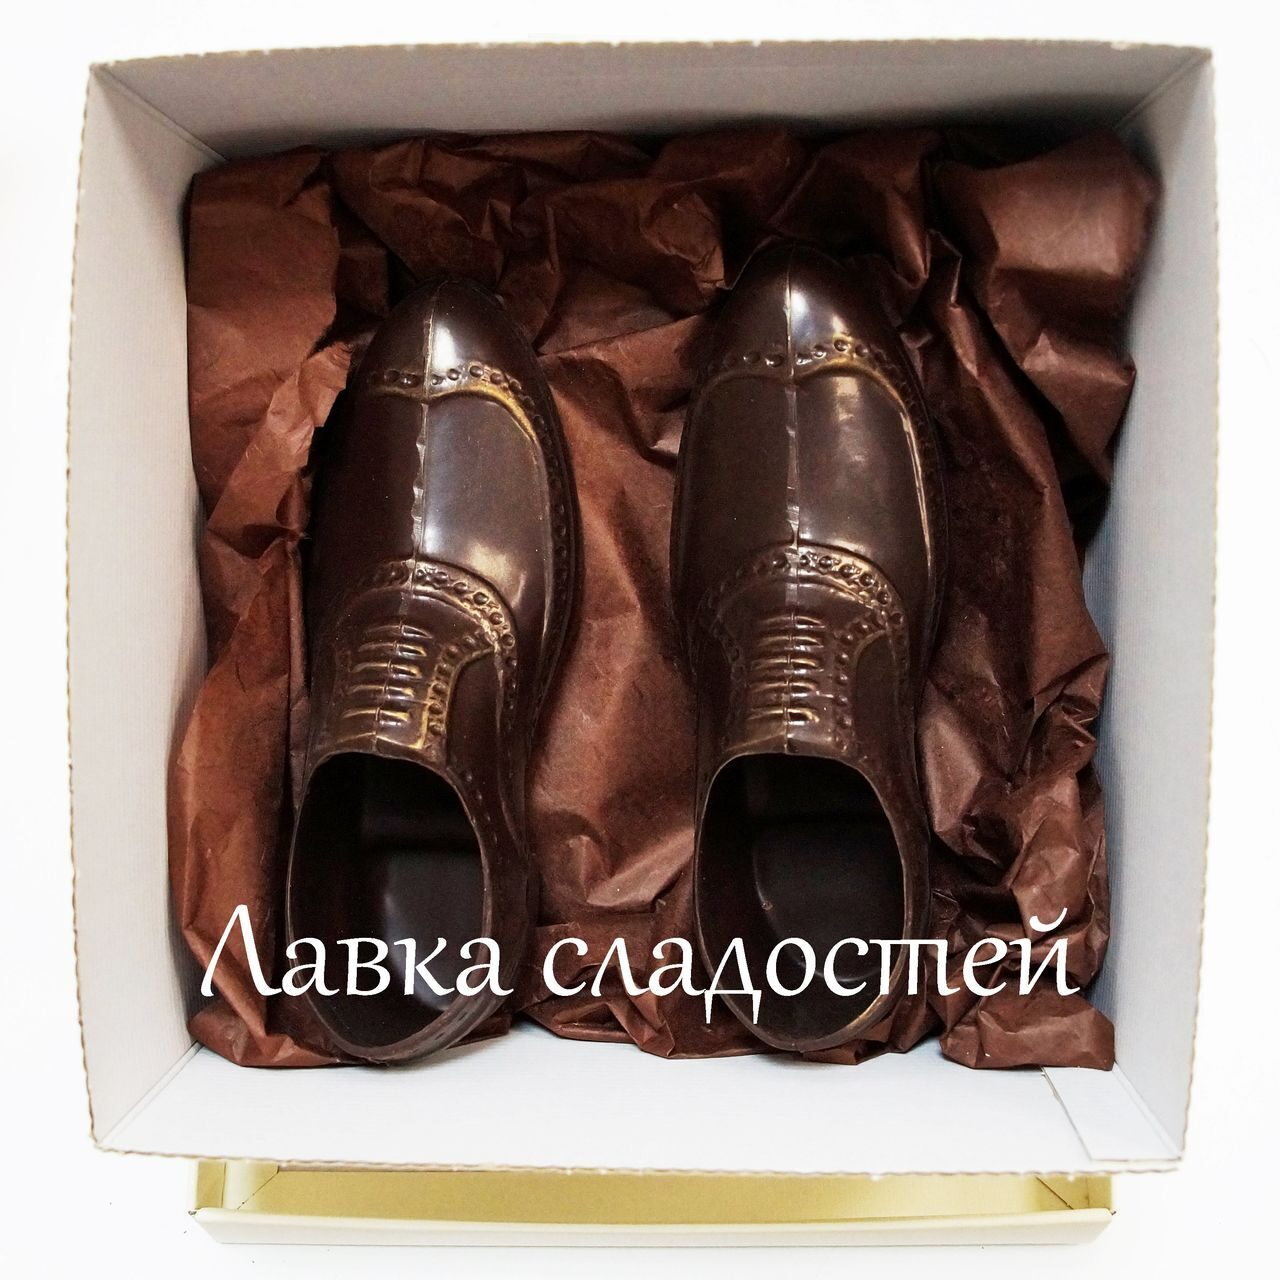 Подарки из шоколада для мужчины 811